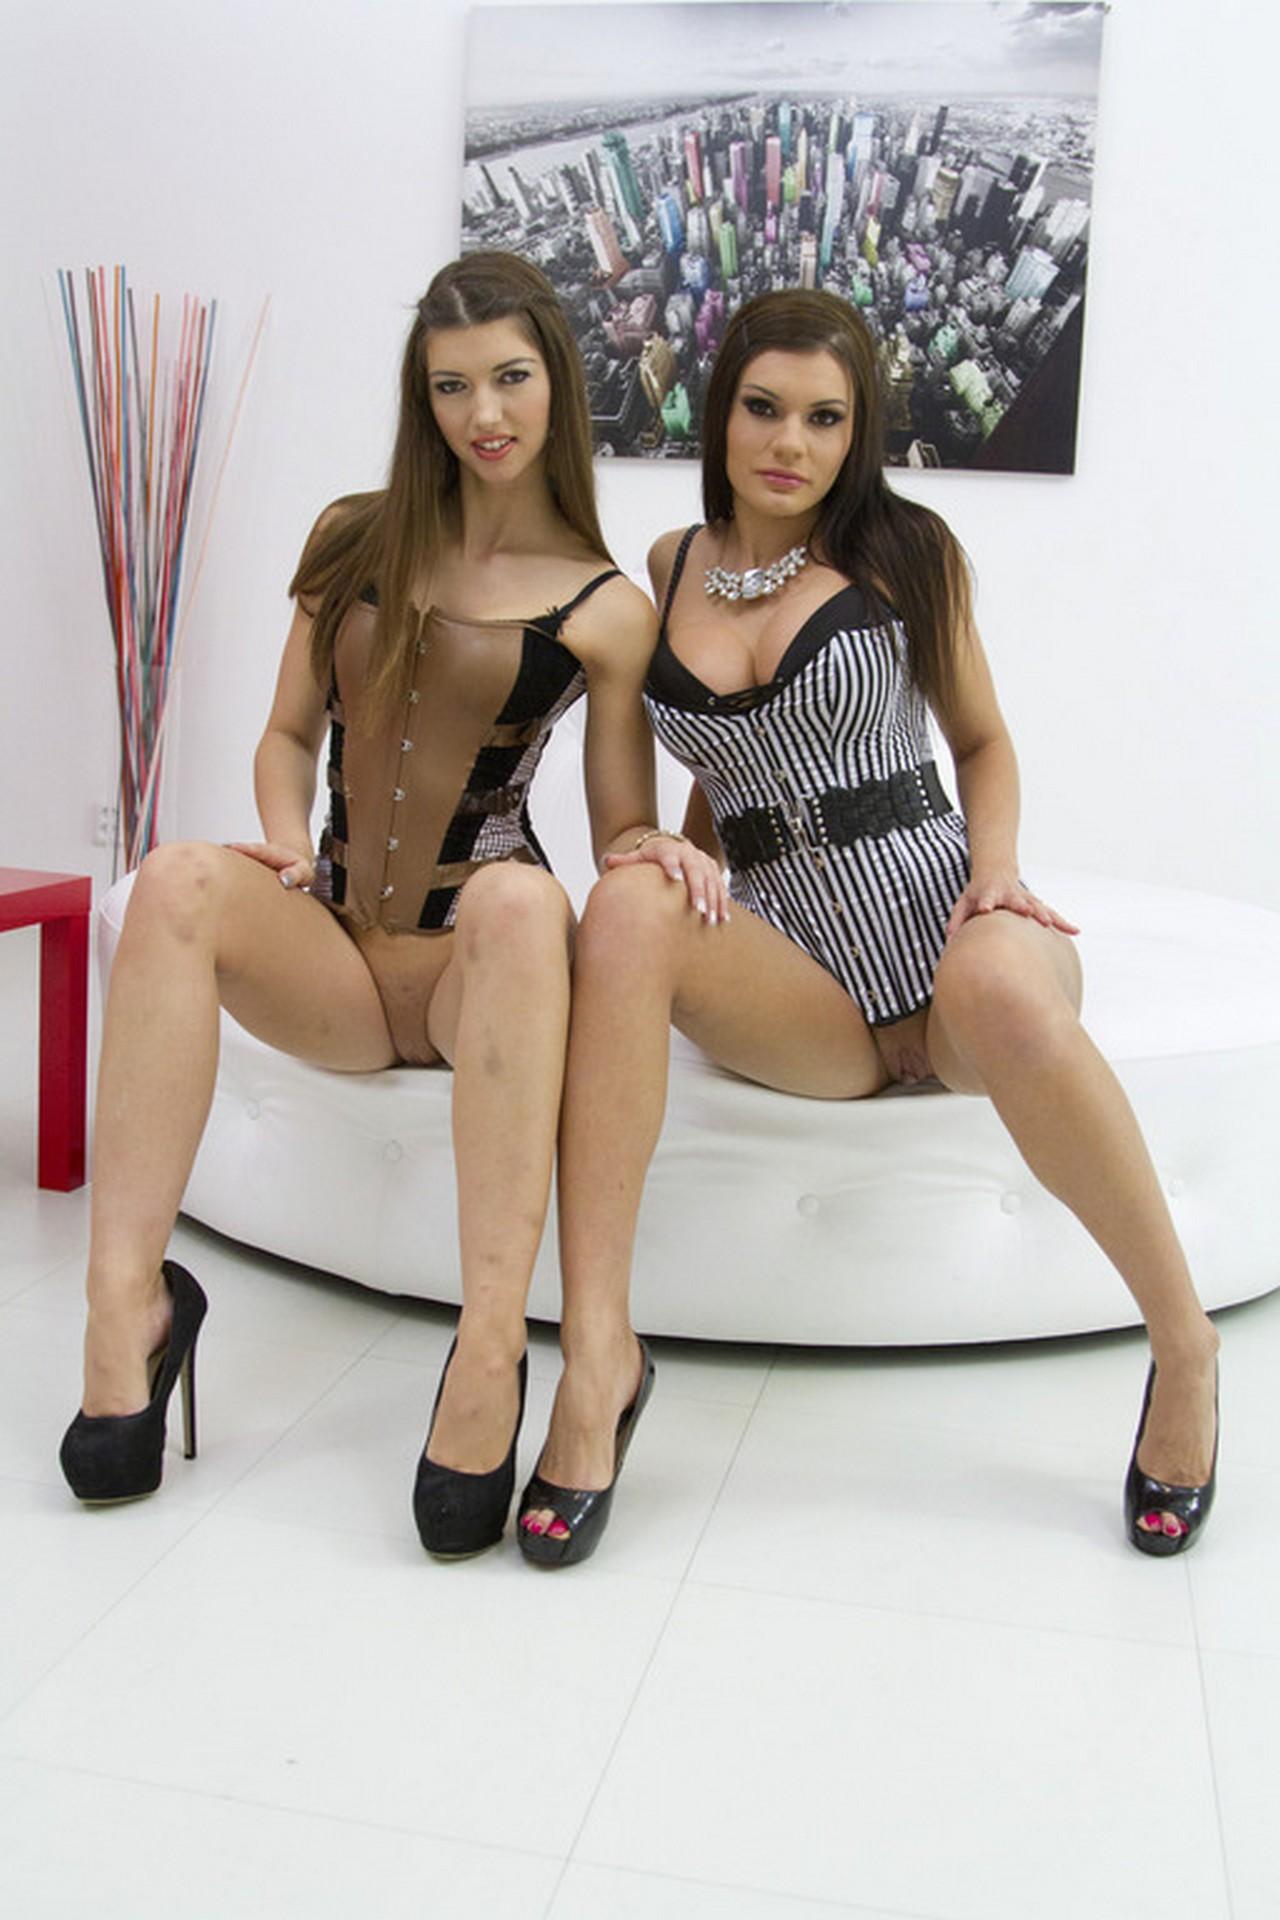 Susan Ayn y Kitana Lure - dos perras expertas del anal doble